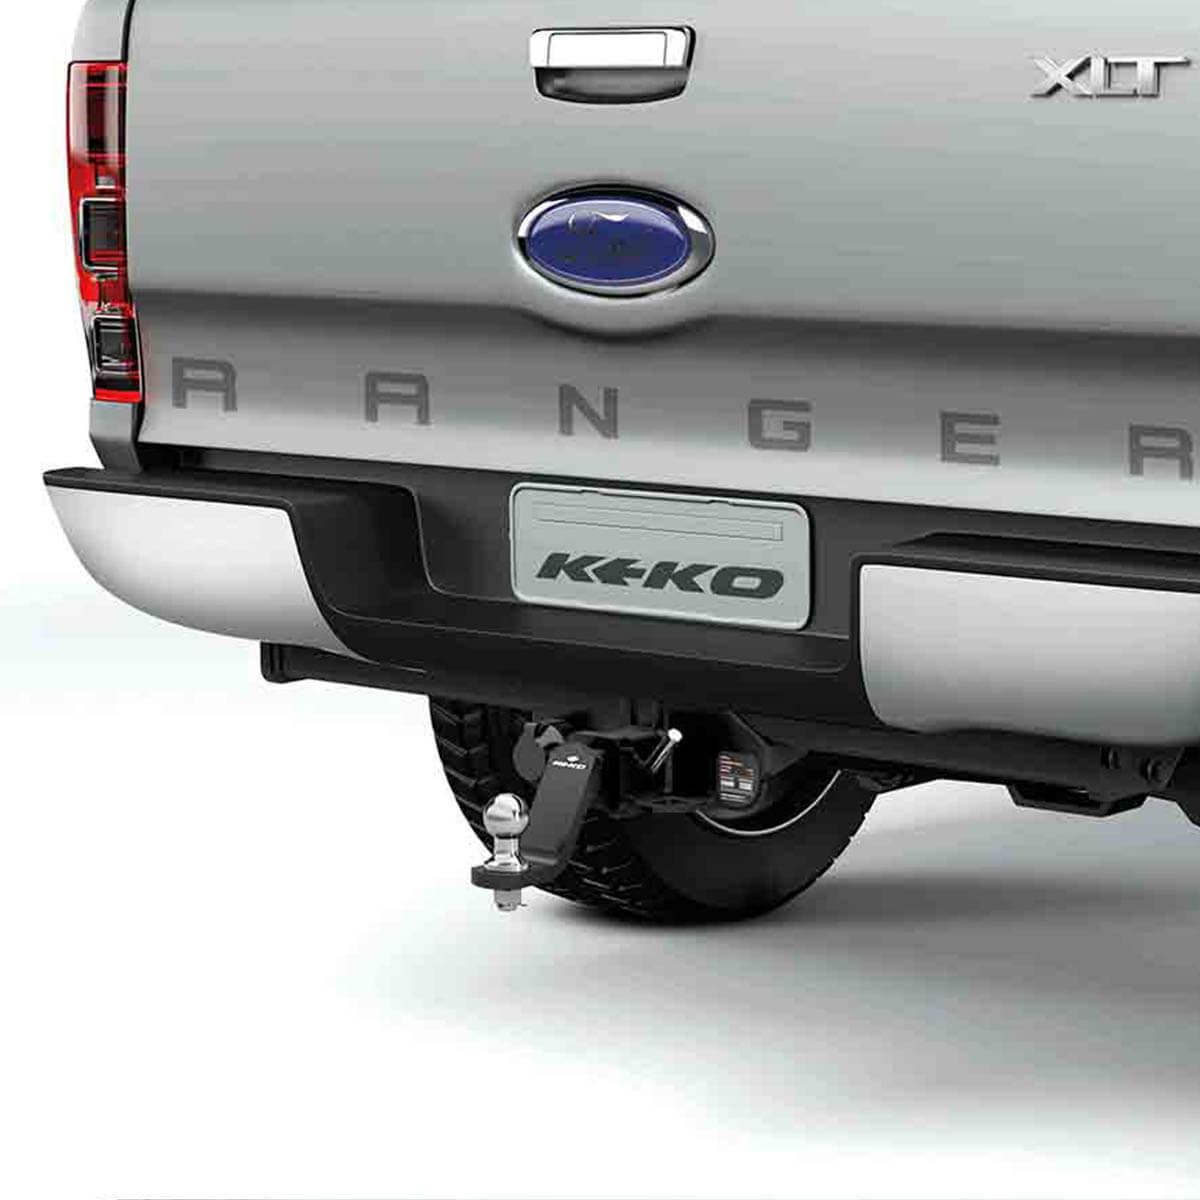 Engate de reboque Nova Ranger 2013 a 2017 Keko K1 removível 1500 kg